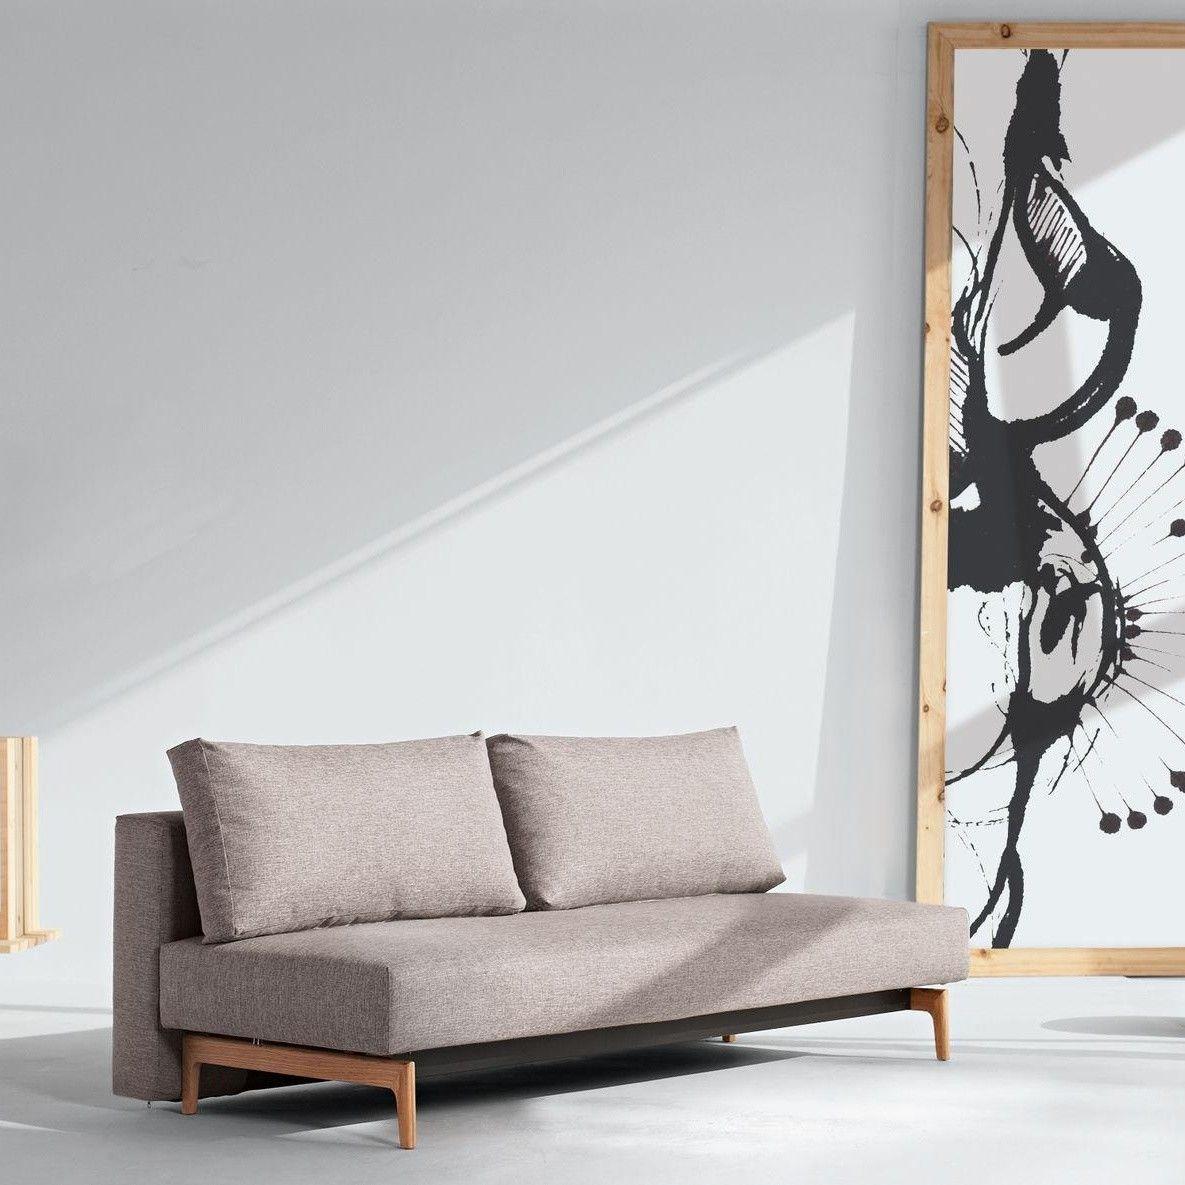 trym schlafsofa innovation. Black Bedroom Furniture Sets. Home Design Ideas